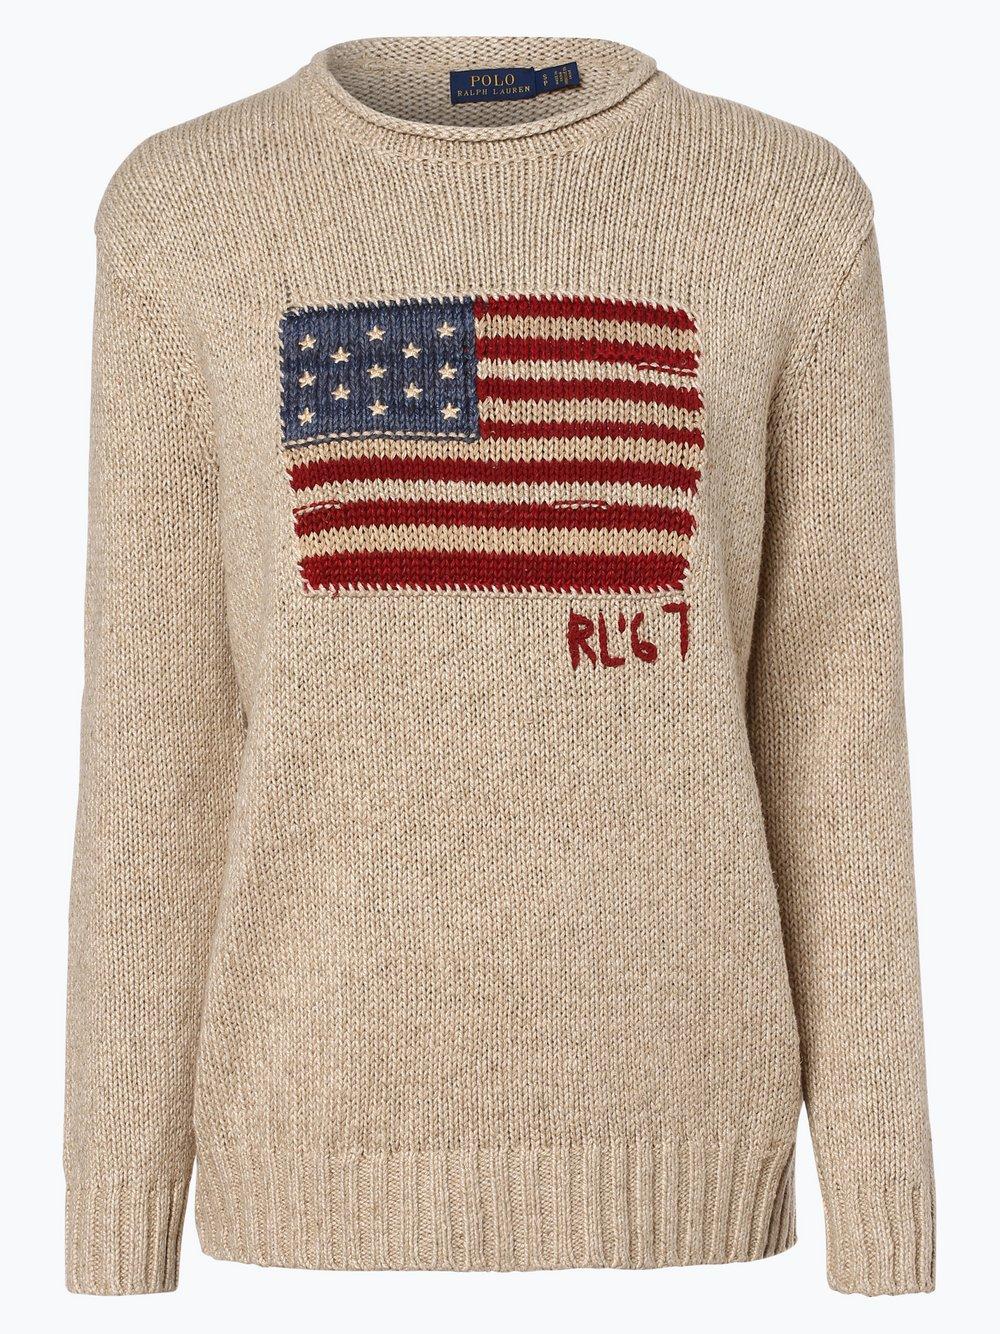 huge discount 6cd8b 72d73 Polo Ralph Lauren Damen Pullover mit Leinen-Anteil online ...